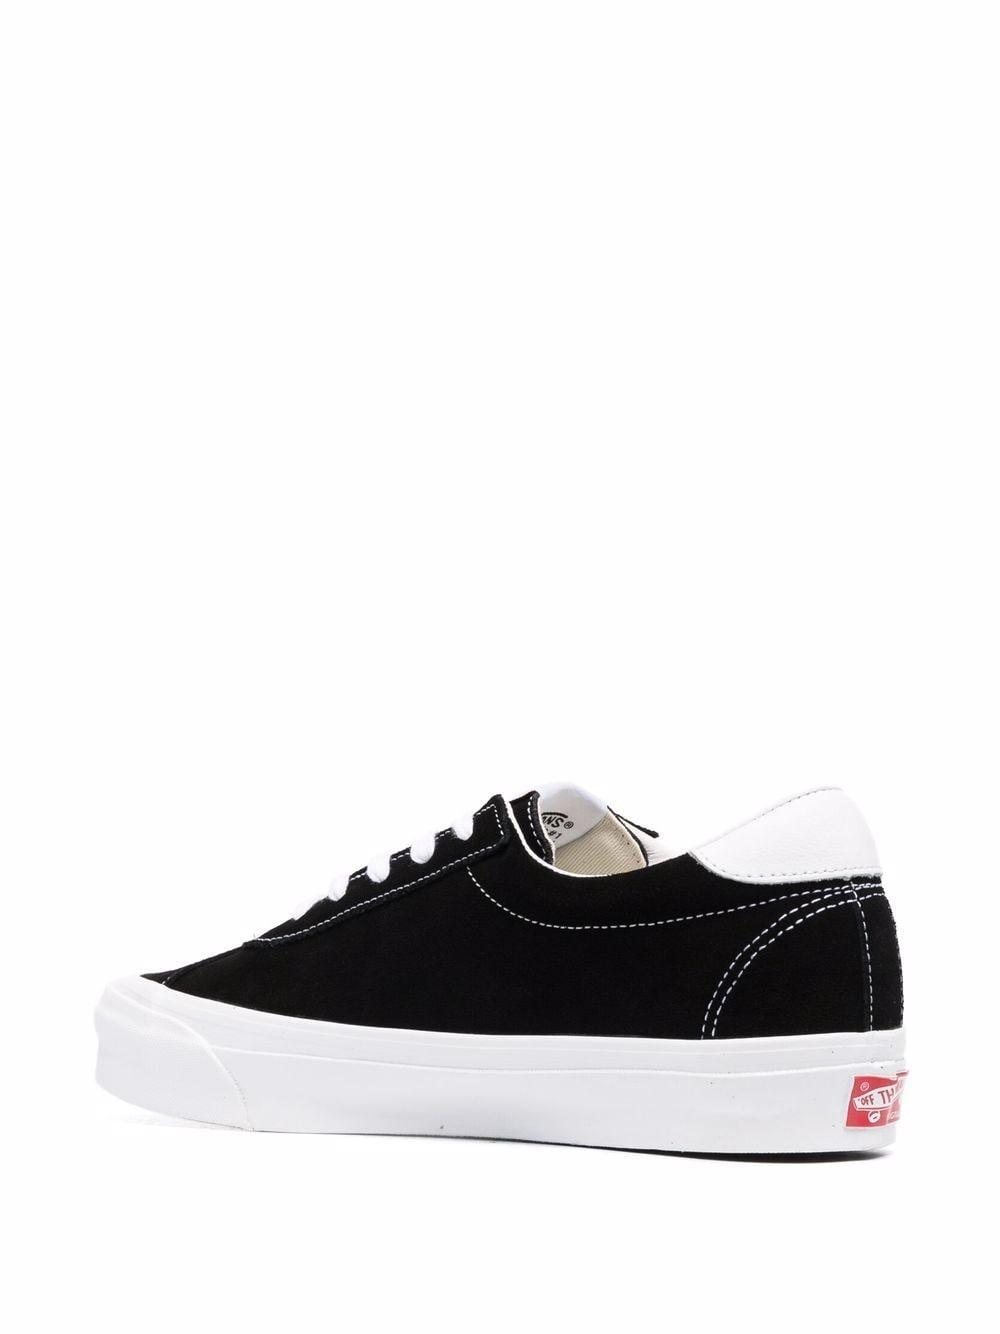 ua og epoch lx sneakers man black in canvas VANS VAULT   Sneakers   VN0A4U12AD31